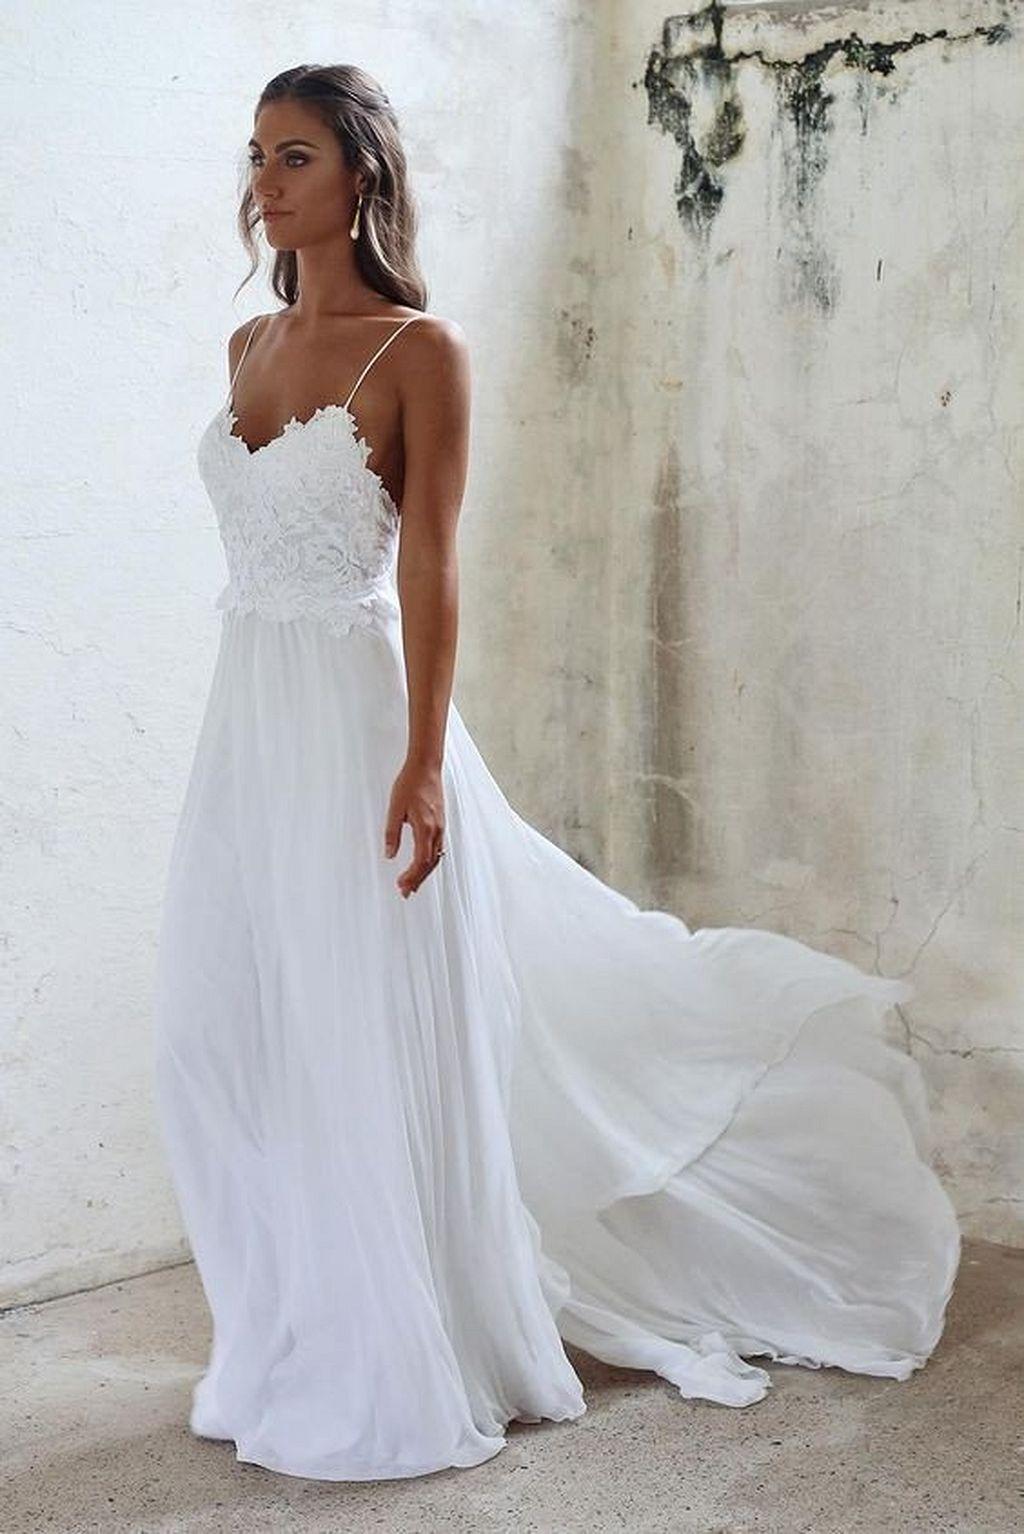 Beach wedding party dresses  Pin by Bradley Tucker on Beach Weddings  Pinterest  Wedding